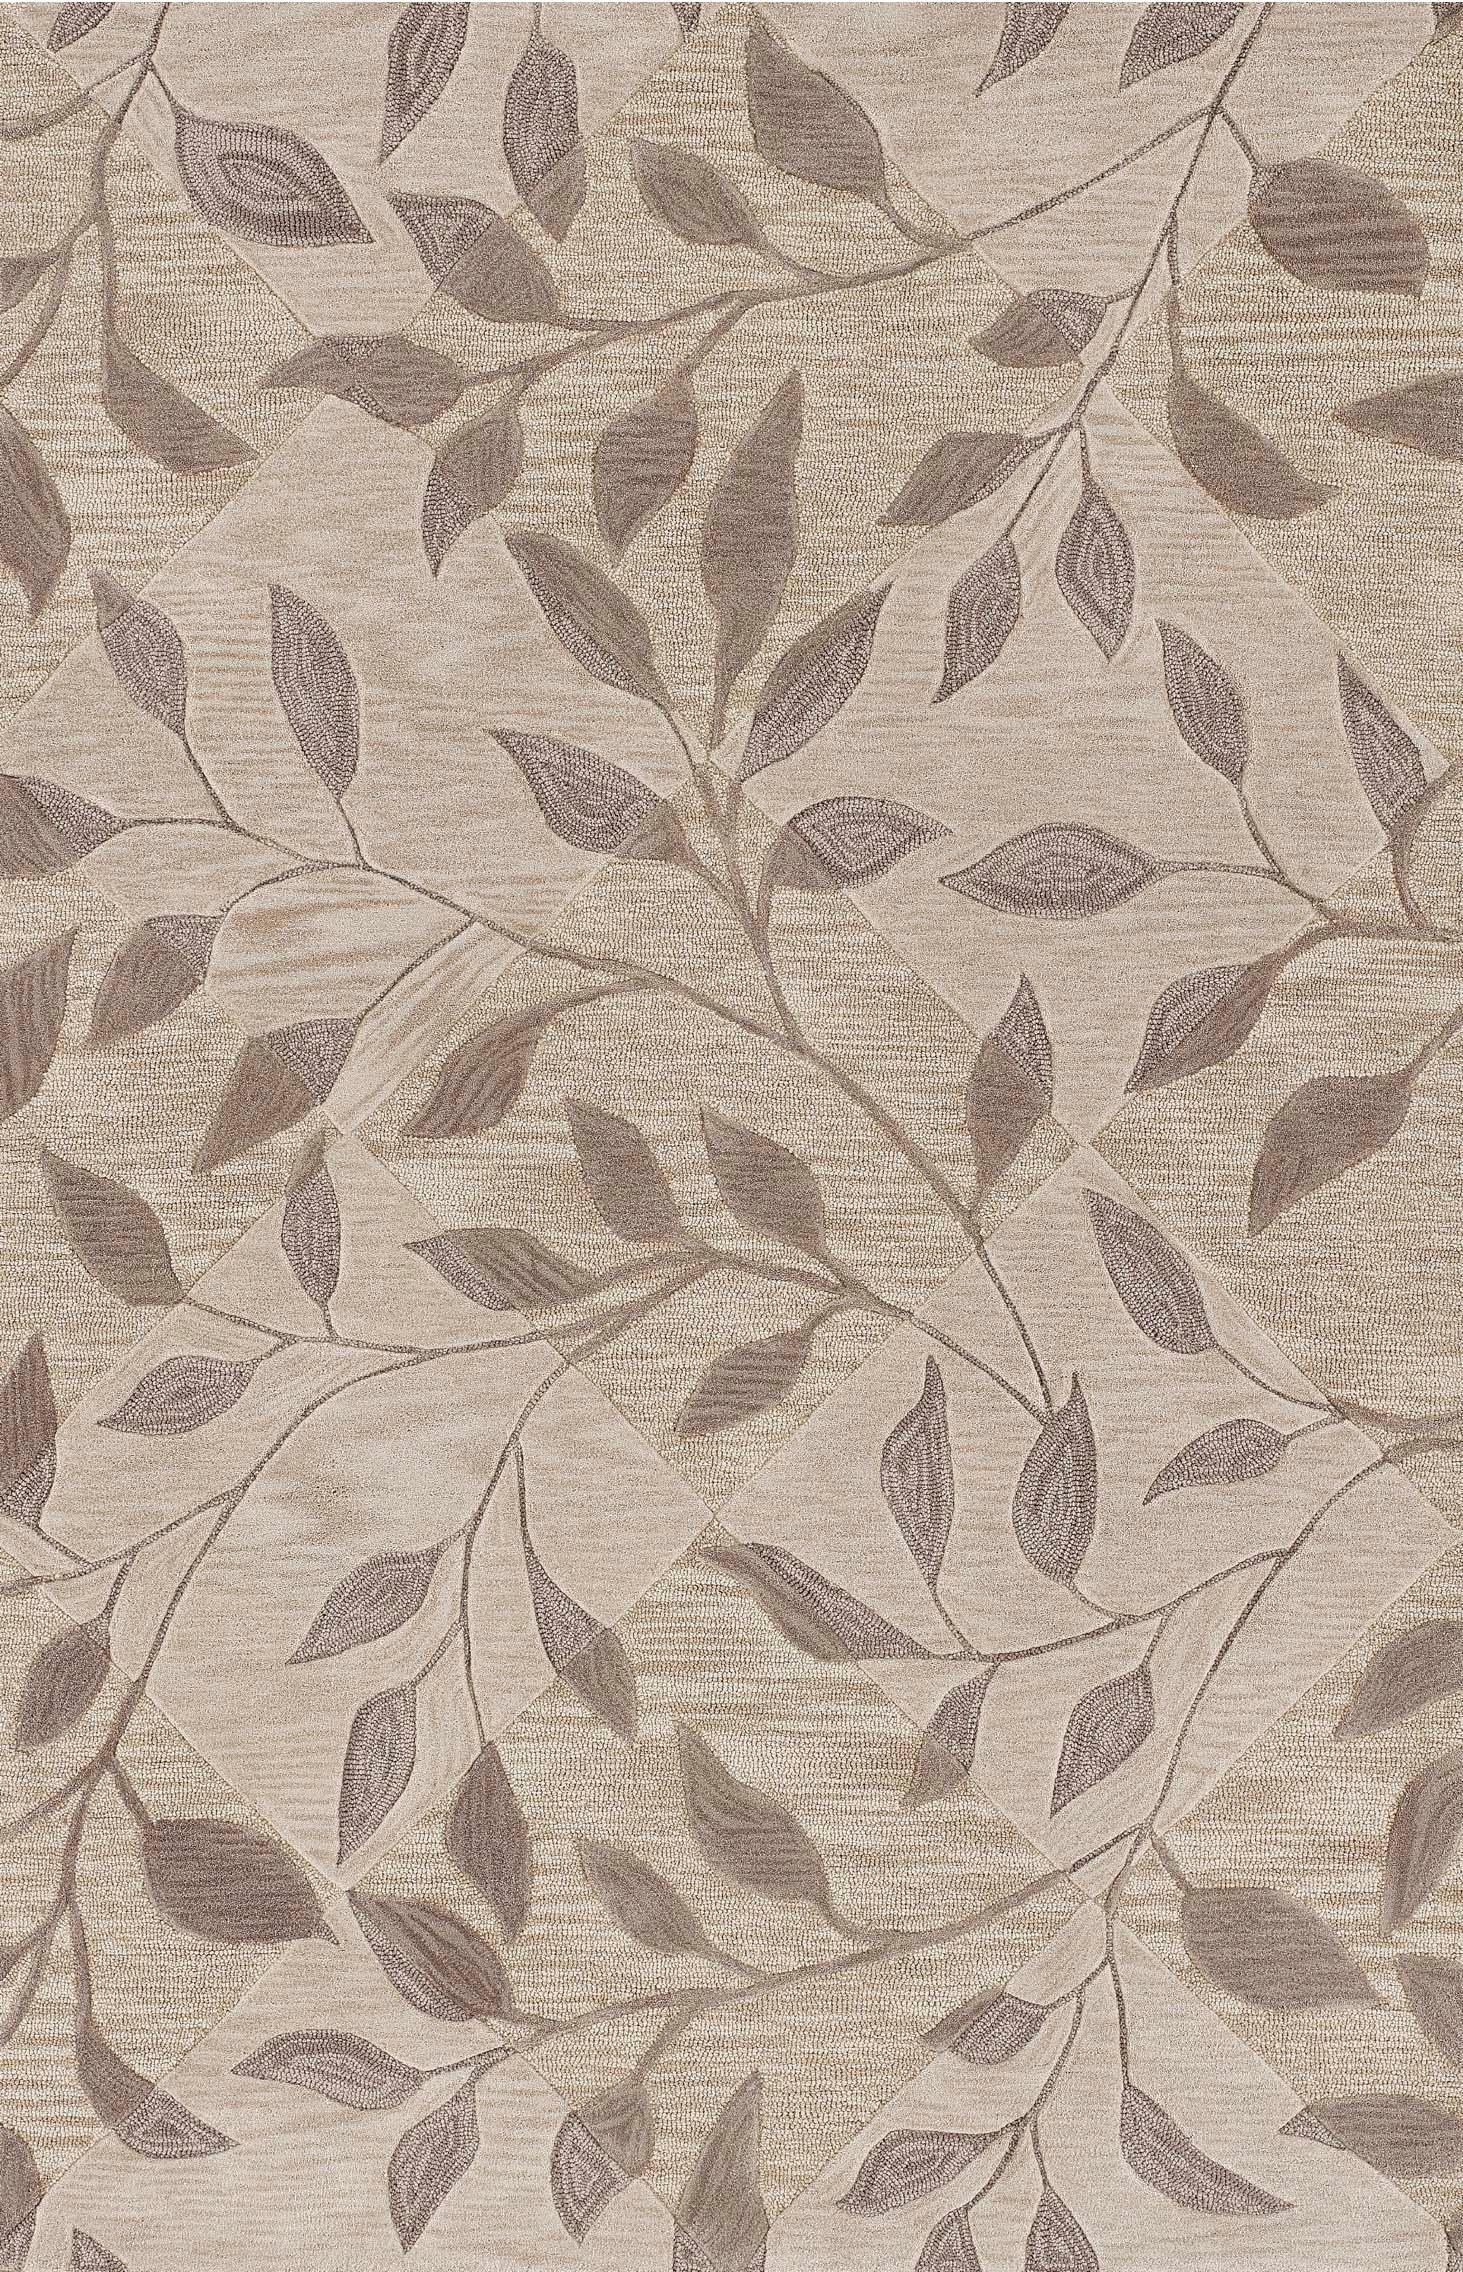 Leaf Texture Ivory Area Rug 5x8 239 Free Ship Rug Studio